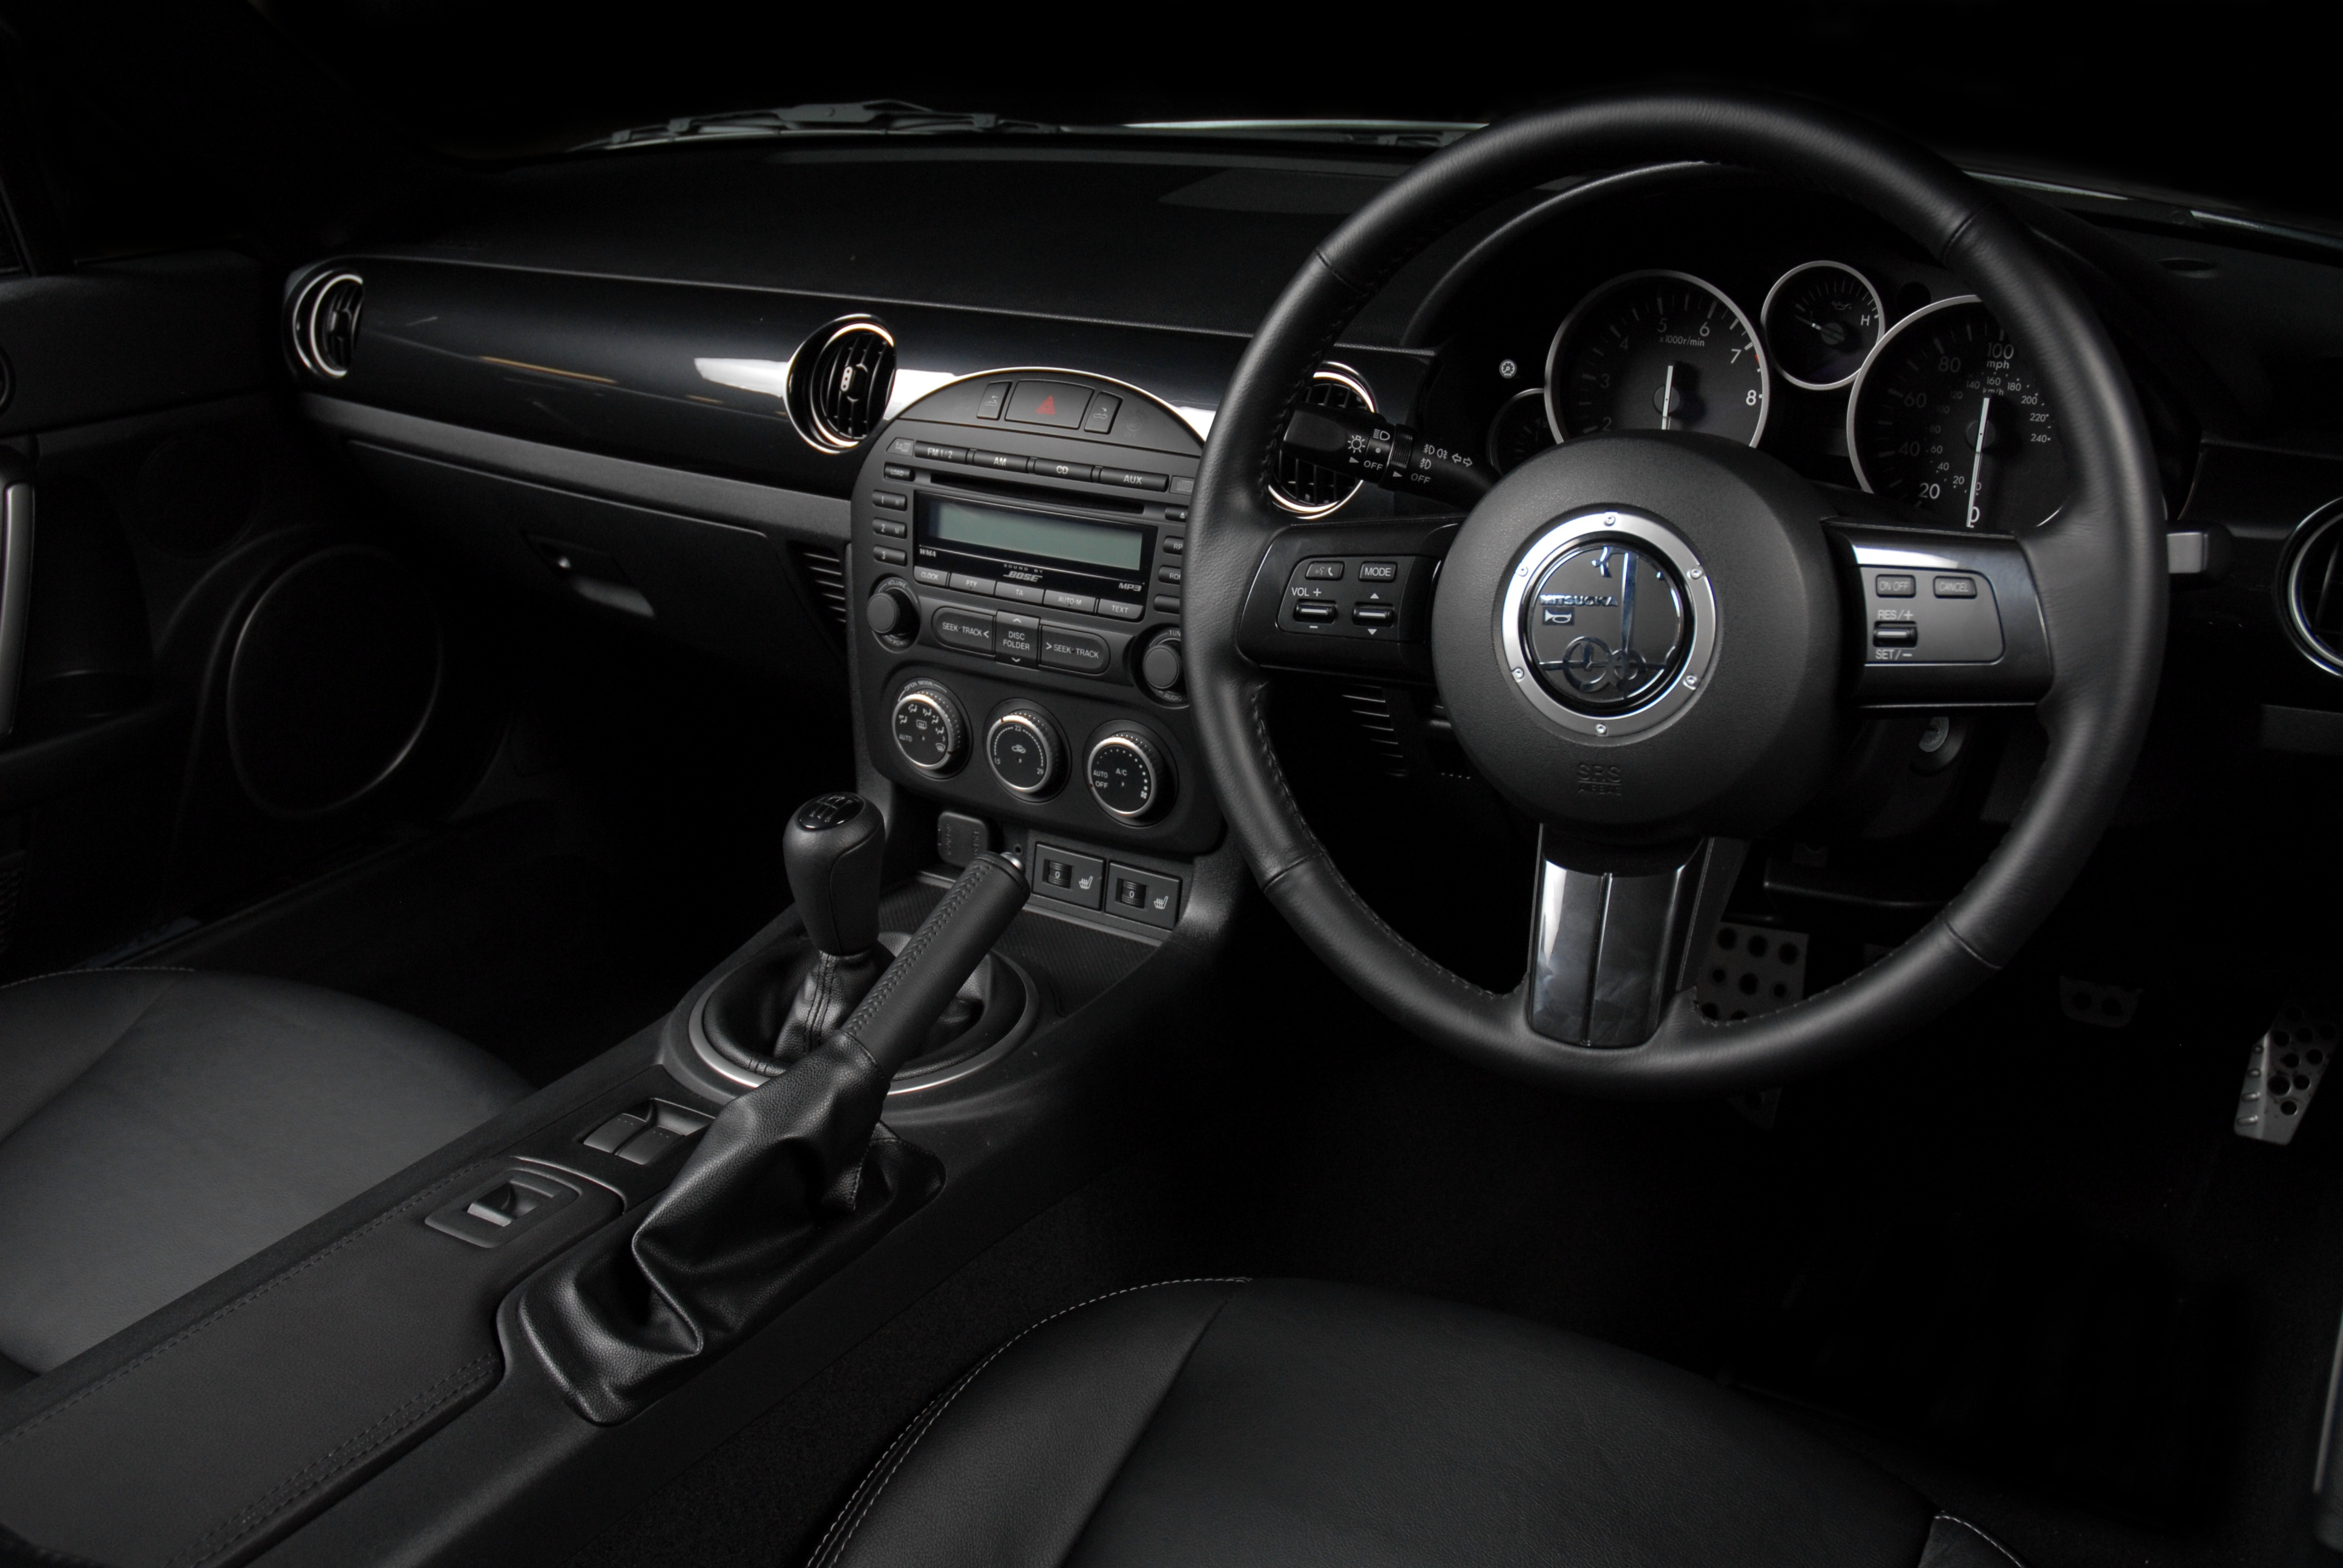 Mitsuoka Roadster interior